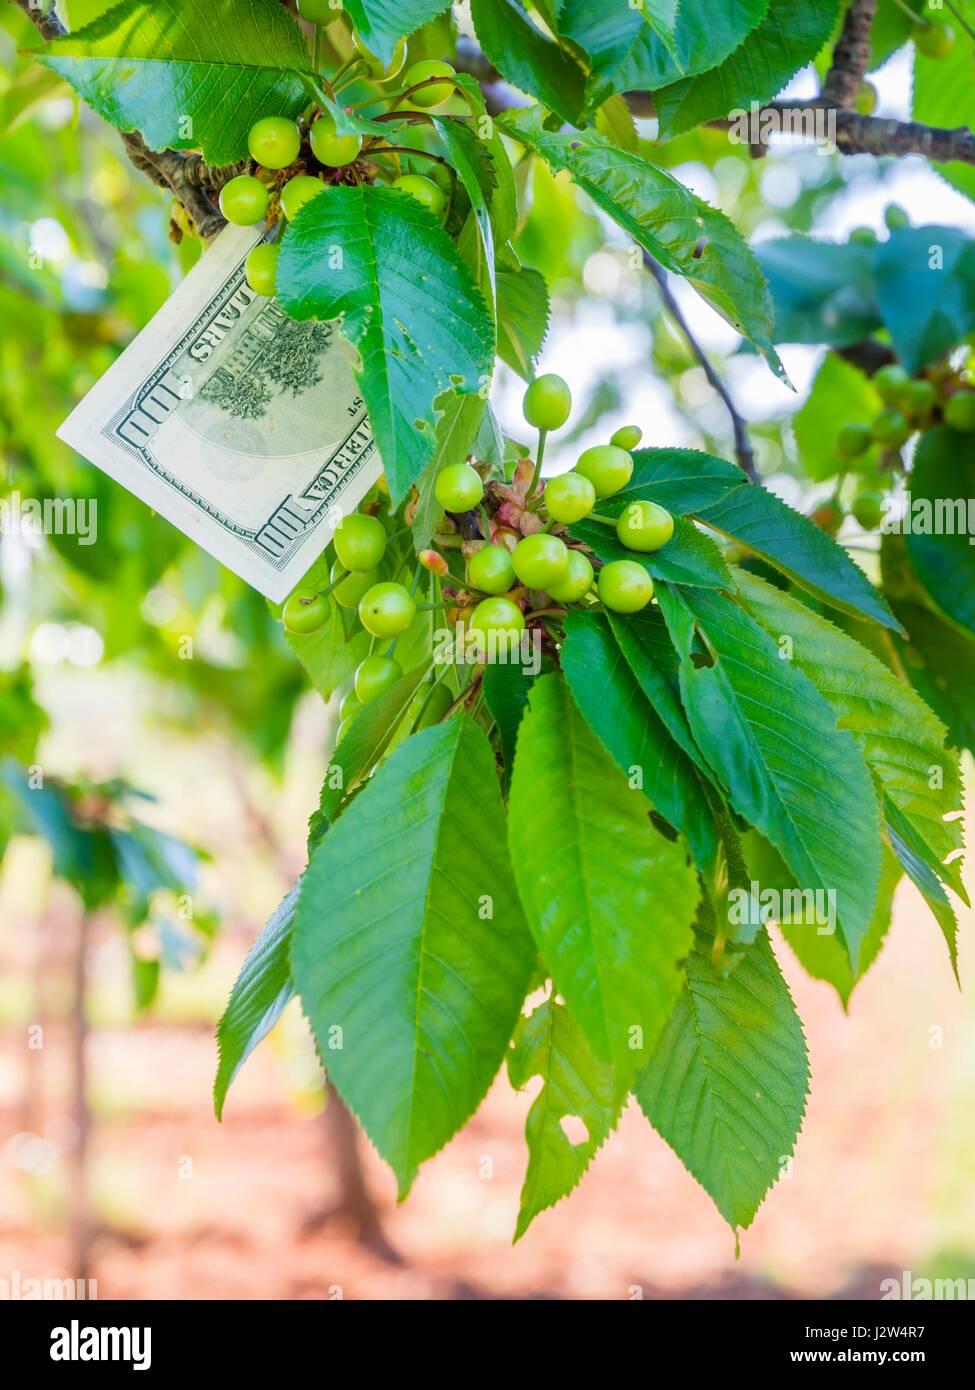 Money growing grow on tree trees - Stock Image